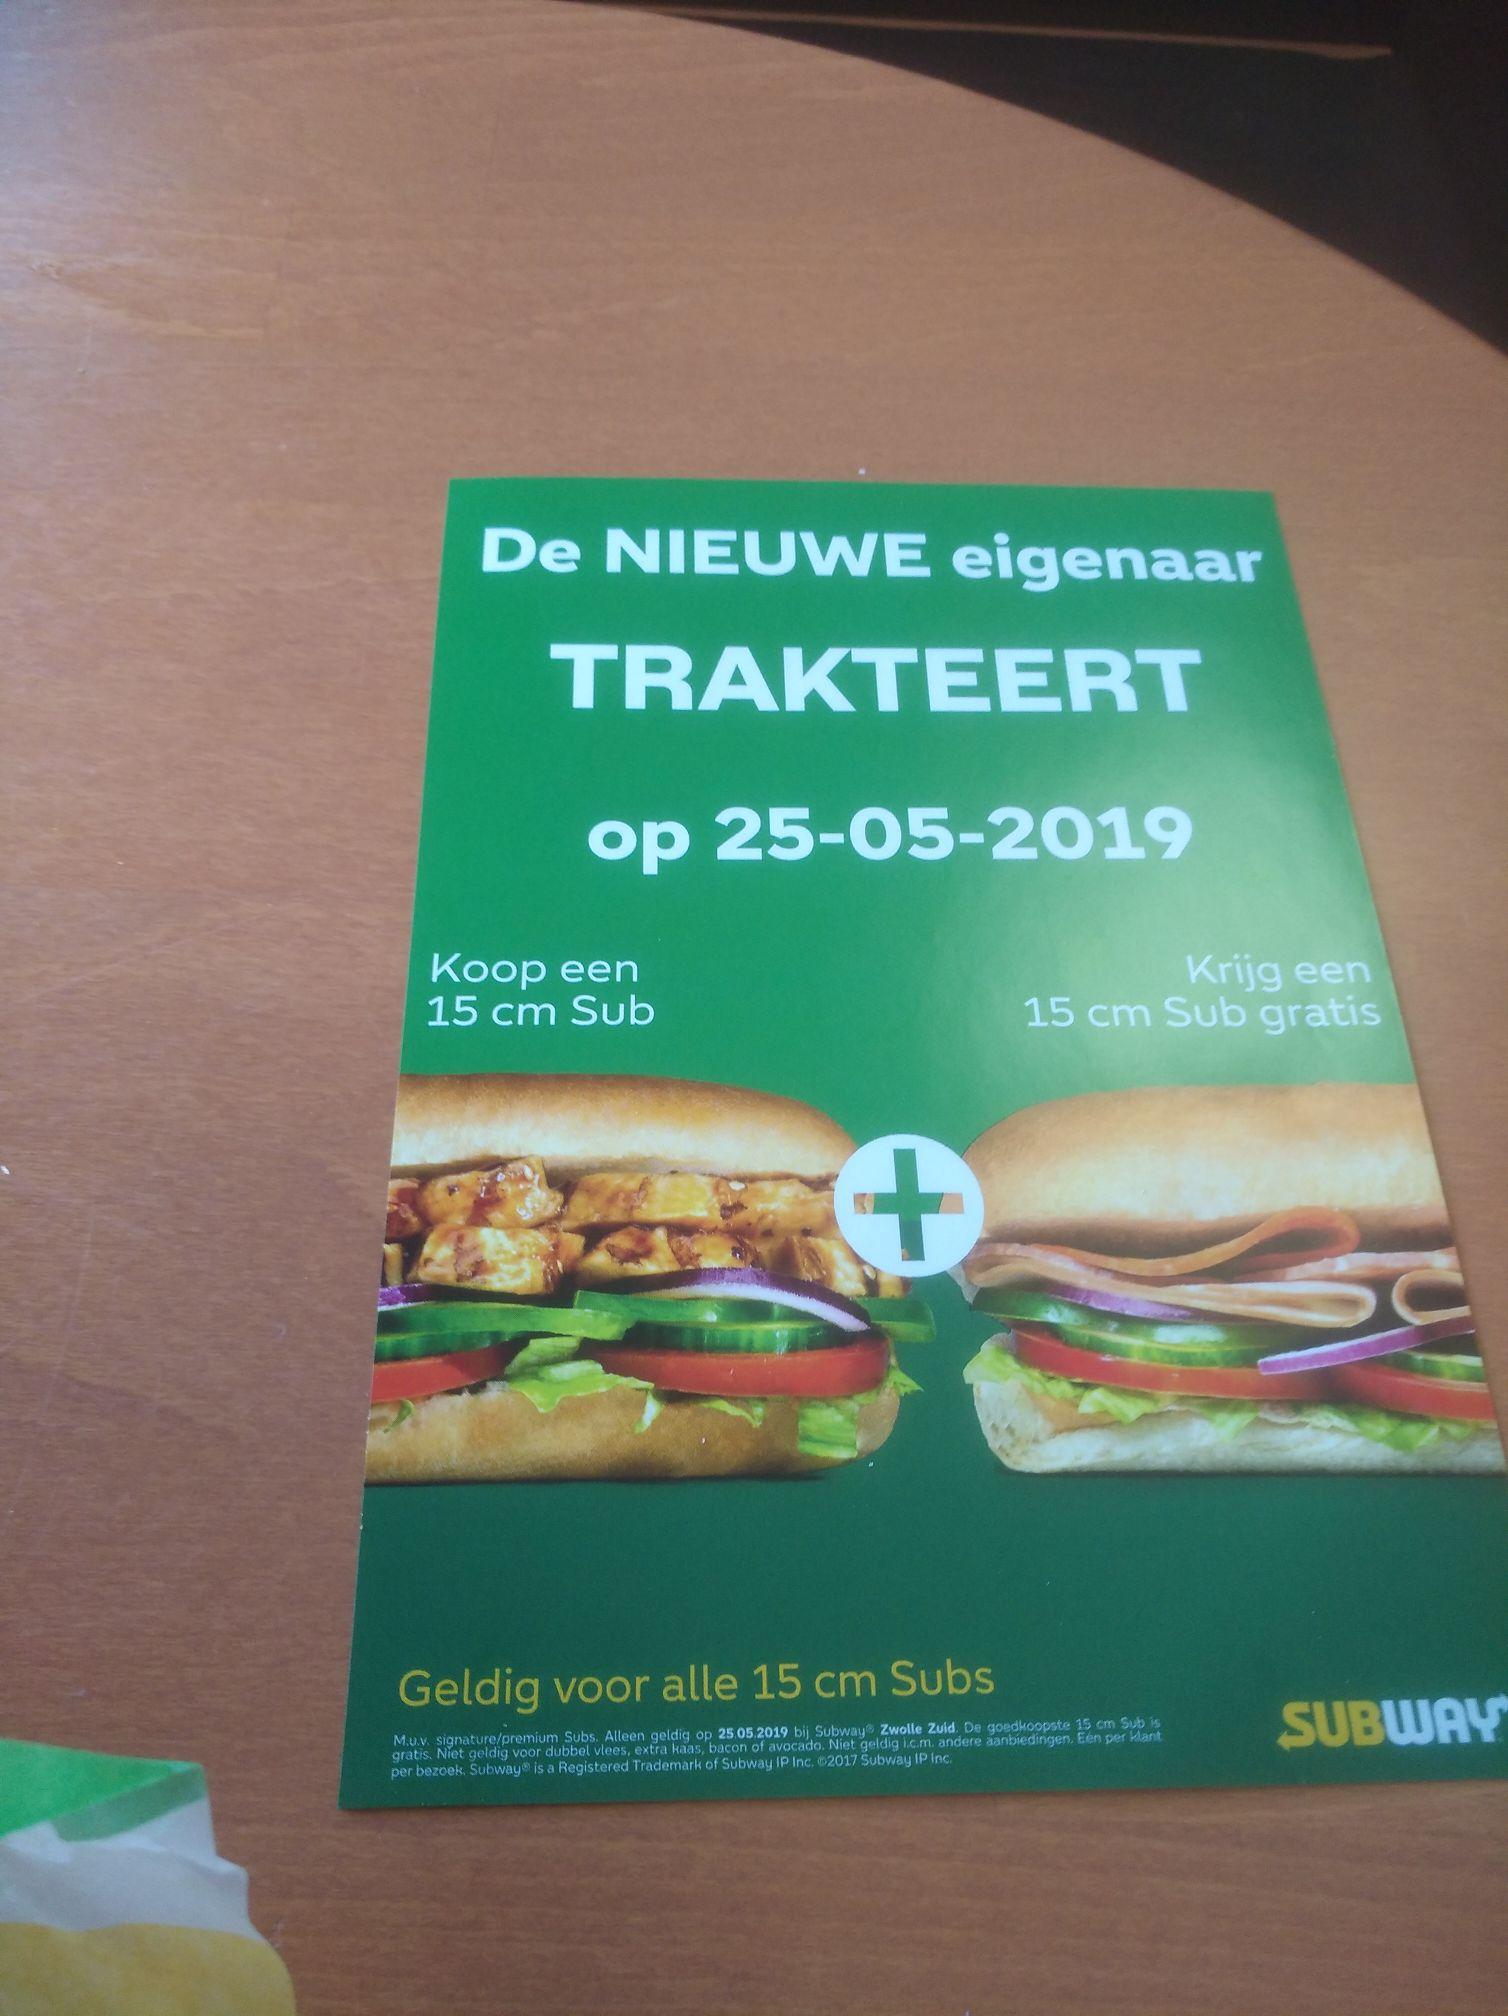 Subway Zwolle Zuid, broodjes 1+1 gratis op zaterdag 25 mei